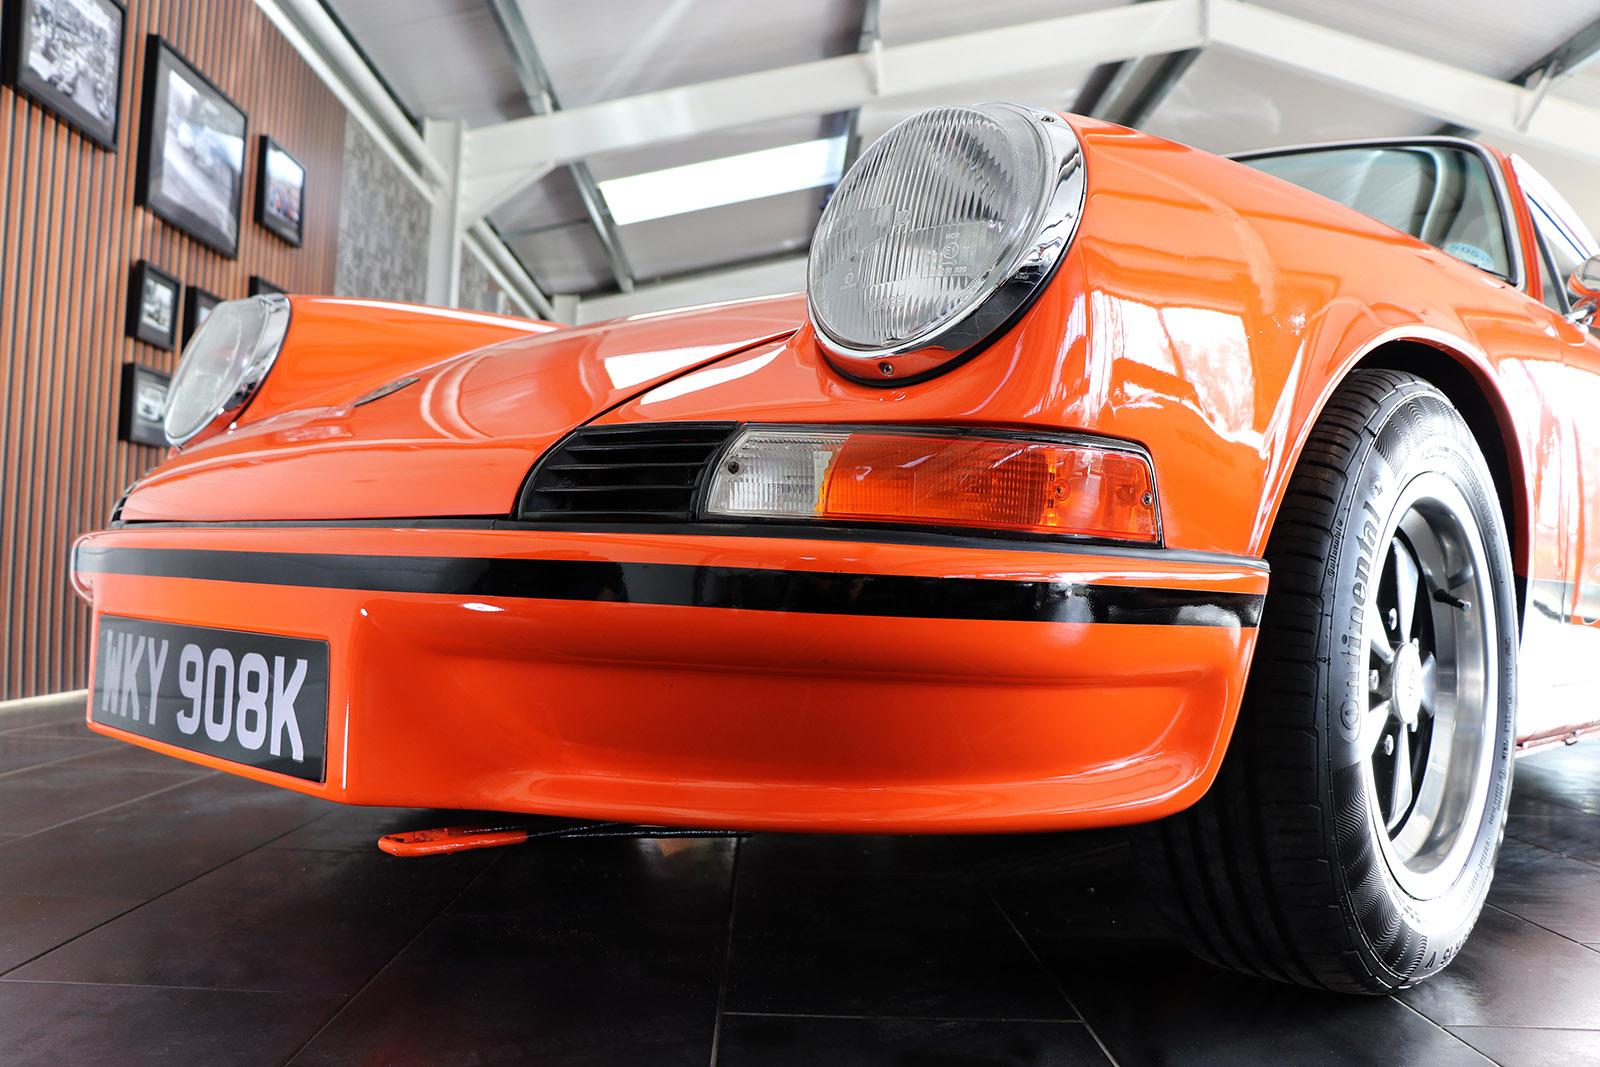 1972-Porsche 911 S-orange-evocation-sayer selection-4-web.jpg